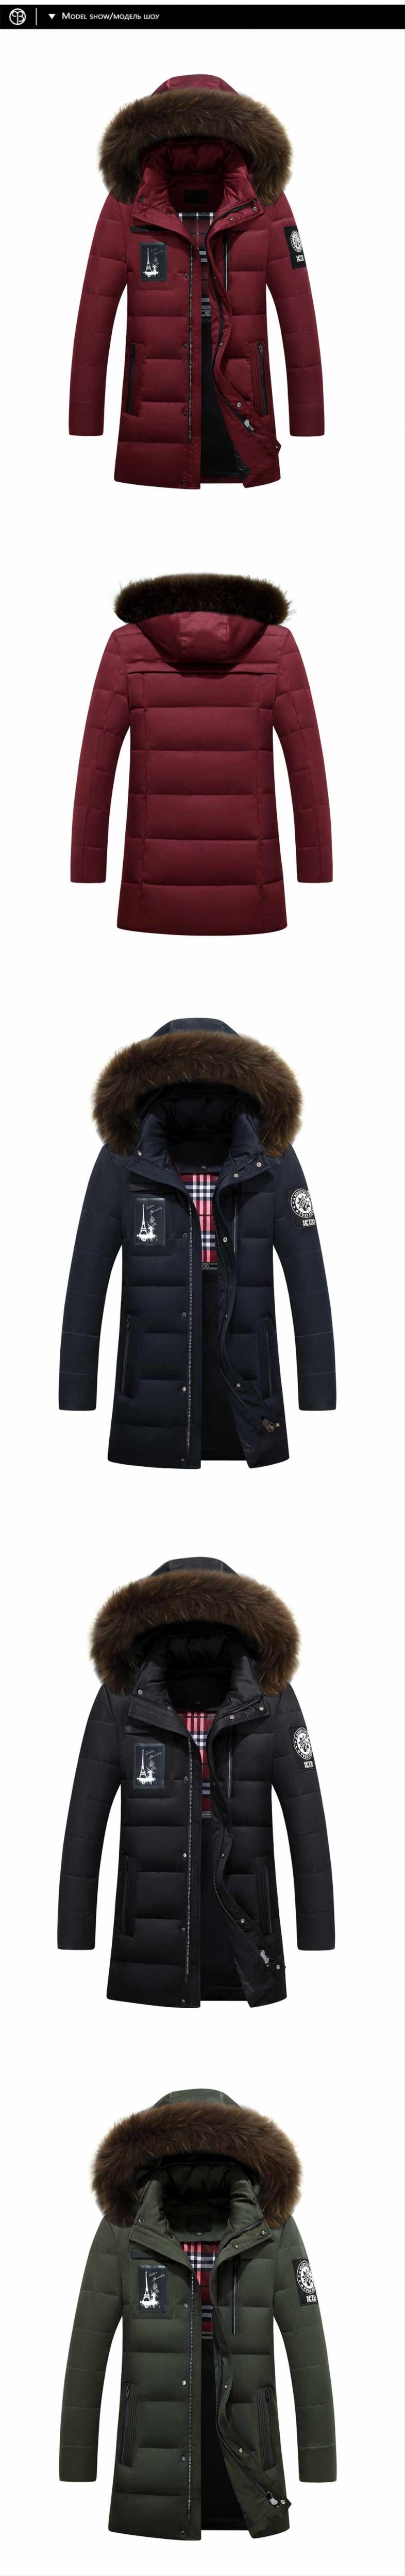 1c9d02abf36f 2016 Mens winter jackets and coats young design sonw parka men duck ...